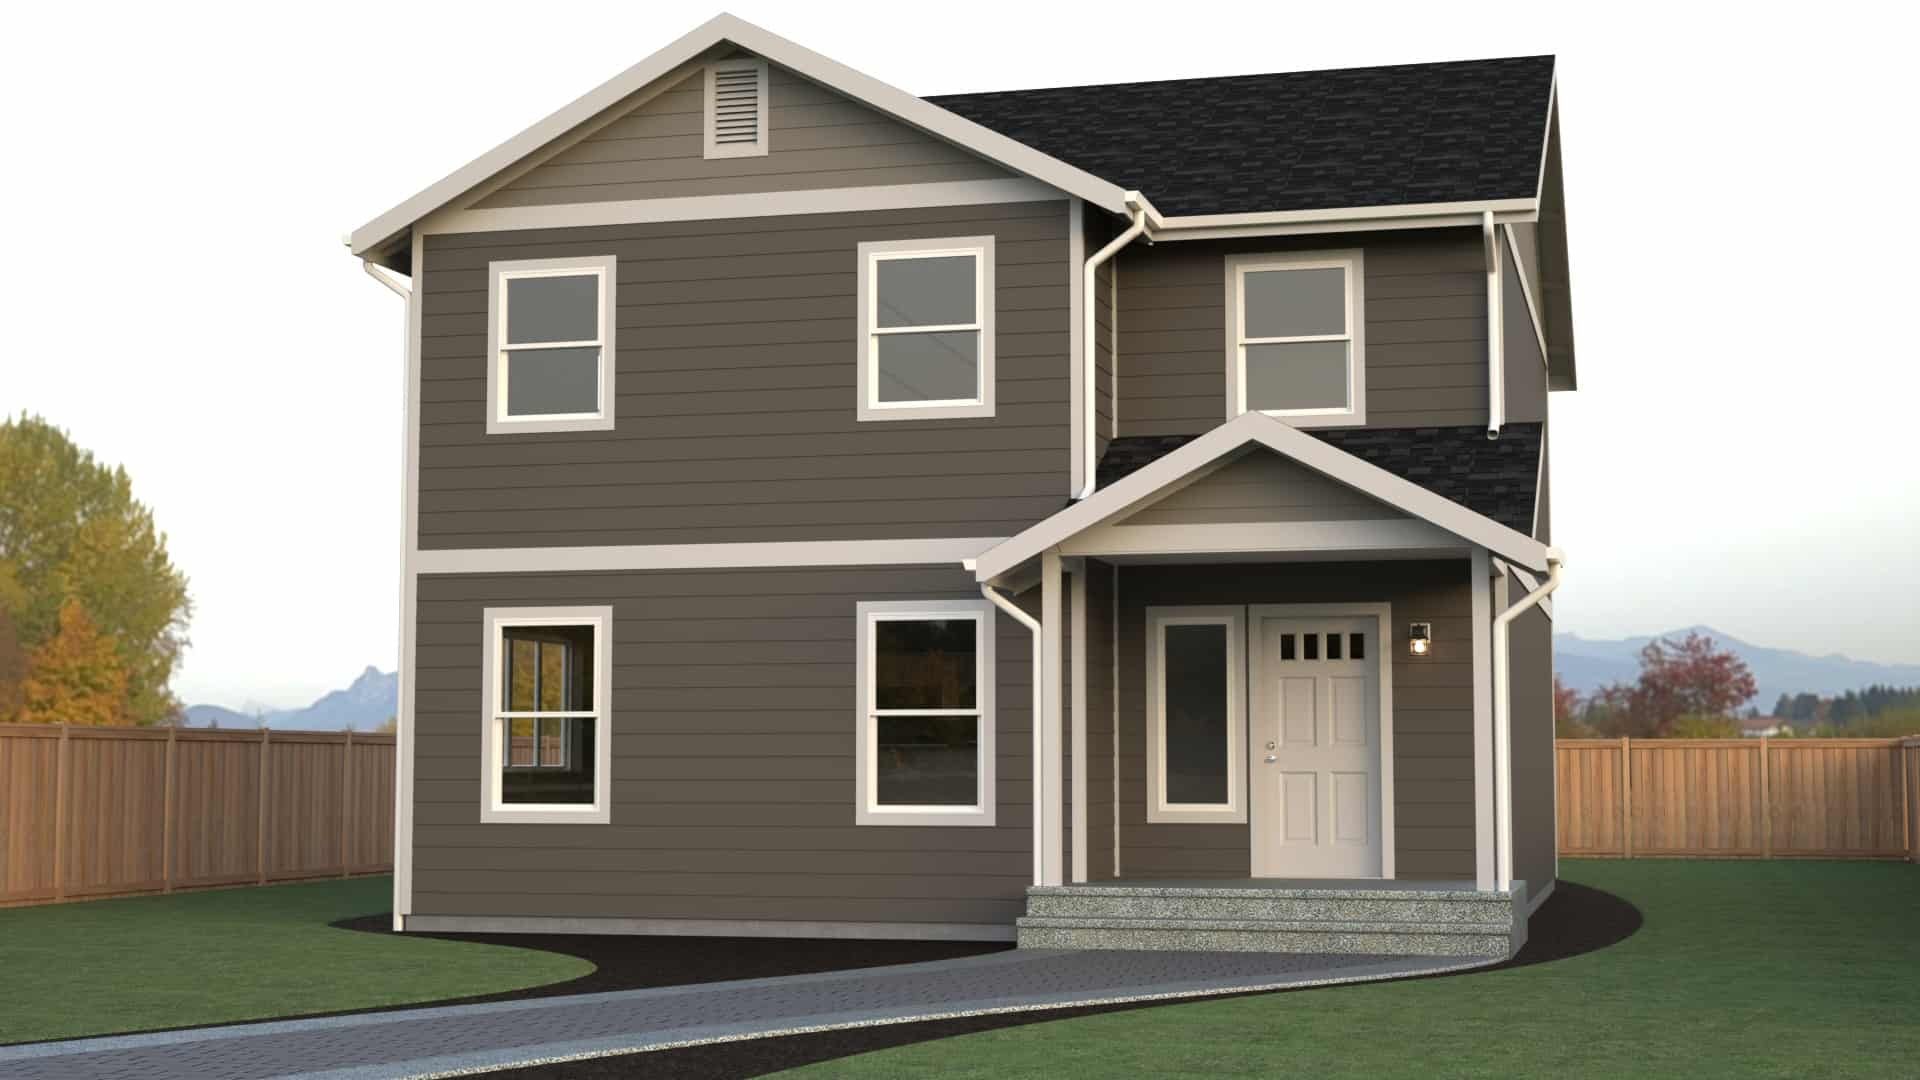 Rainier Home Plan - True Built Home on